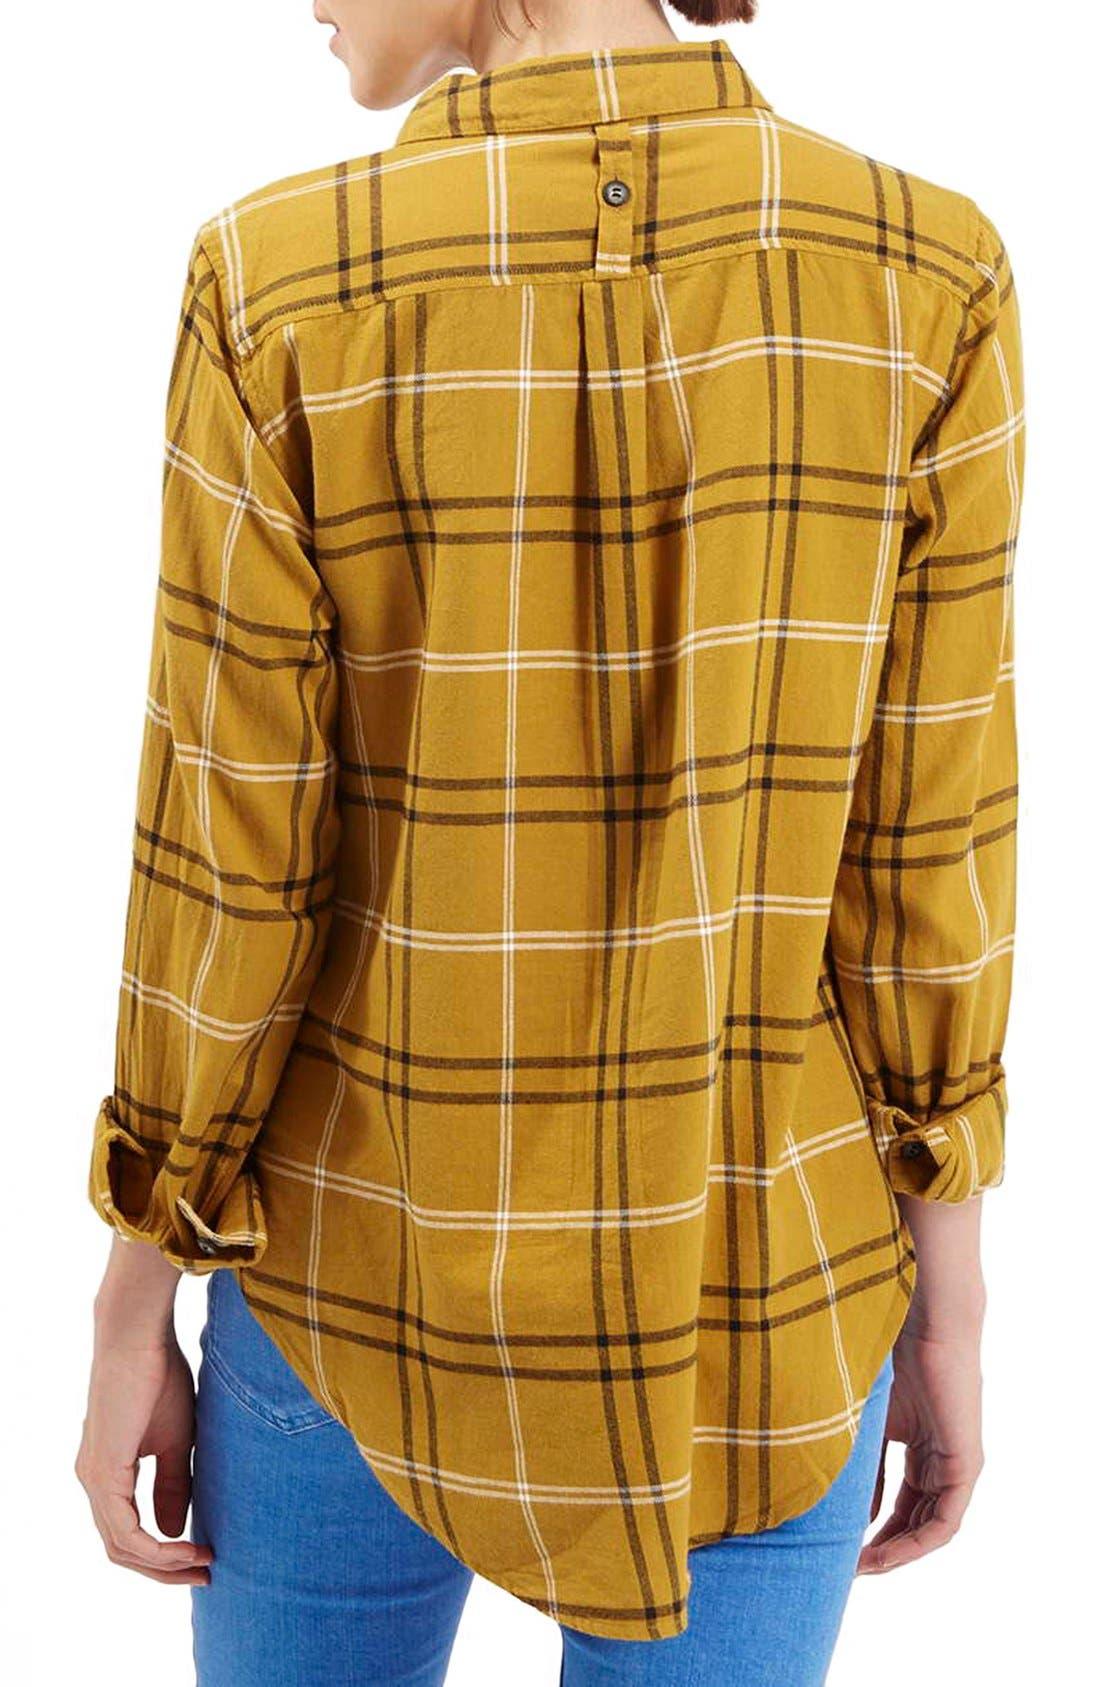 TOPSHOP, 'Billie' Check Button FrontBoyfriend Shirt, Alternate thumbnail 2, color, 701